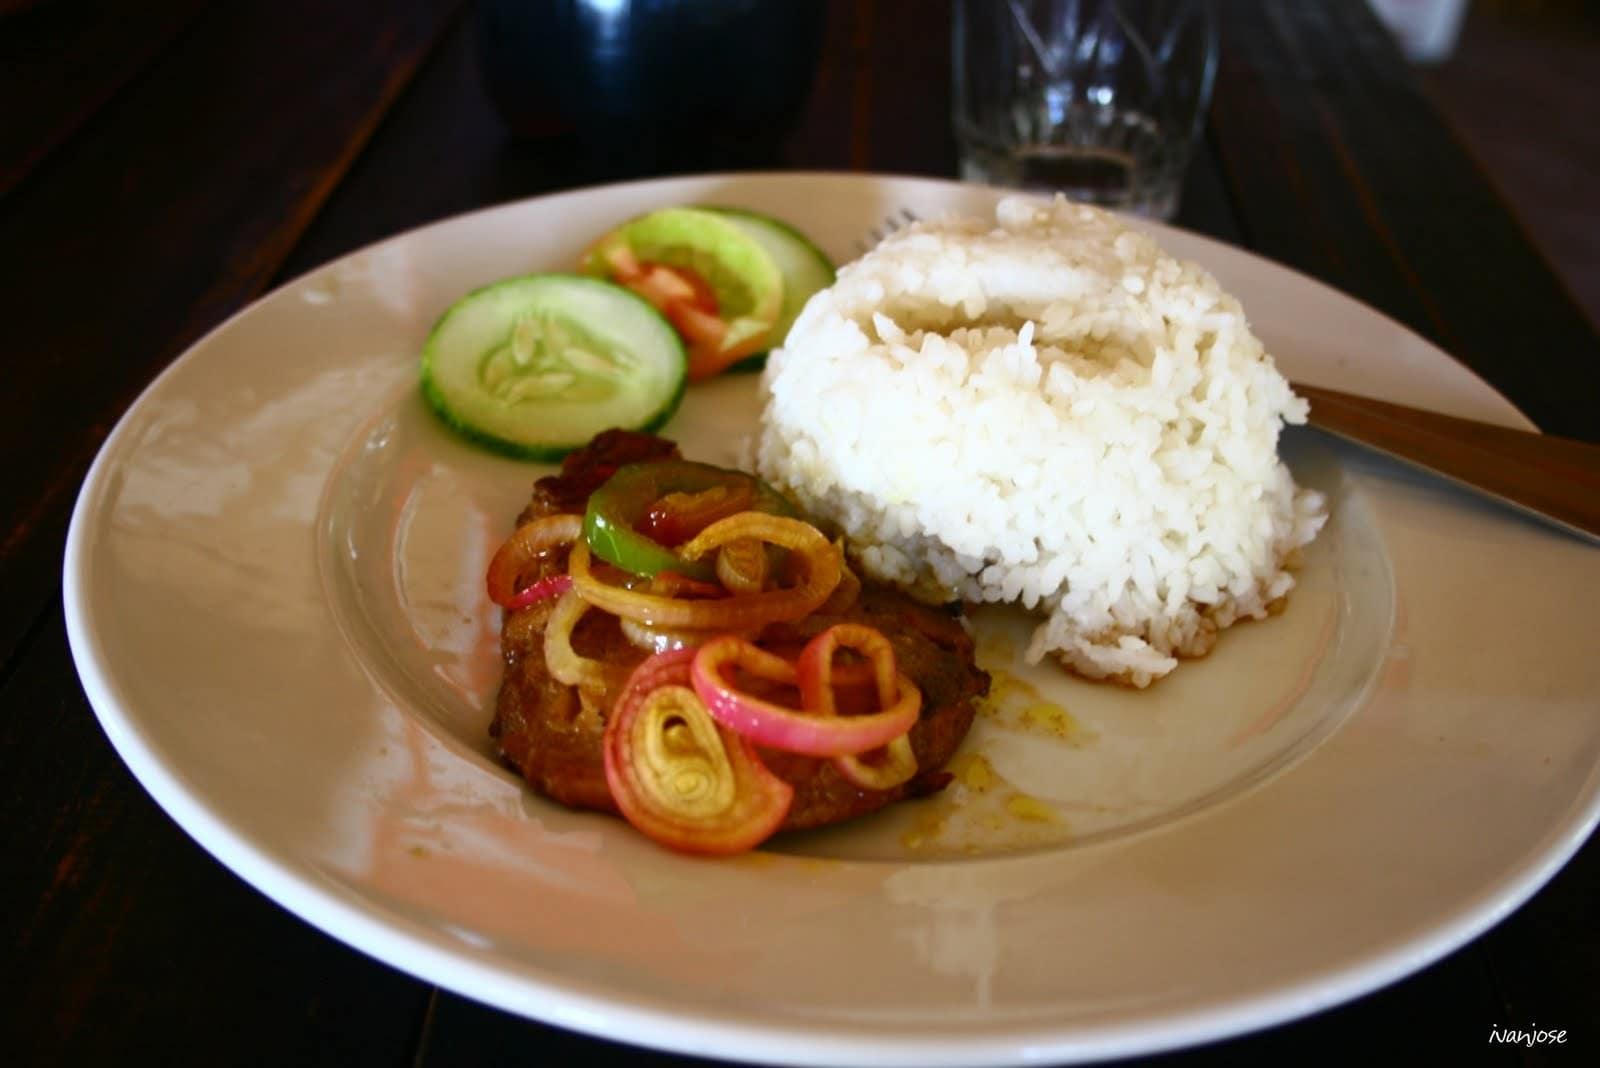 Fish belly steak from Isla Jardin del Mar Beach Resort's restaurant